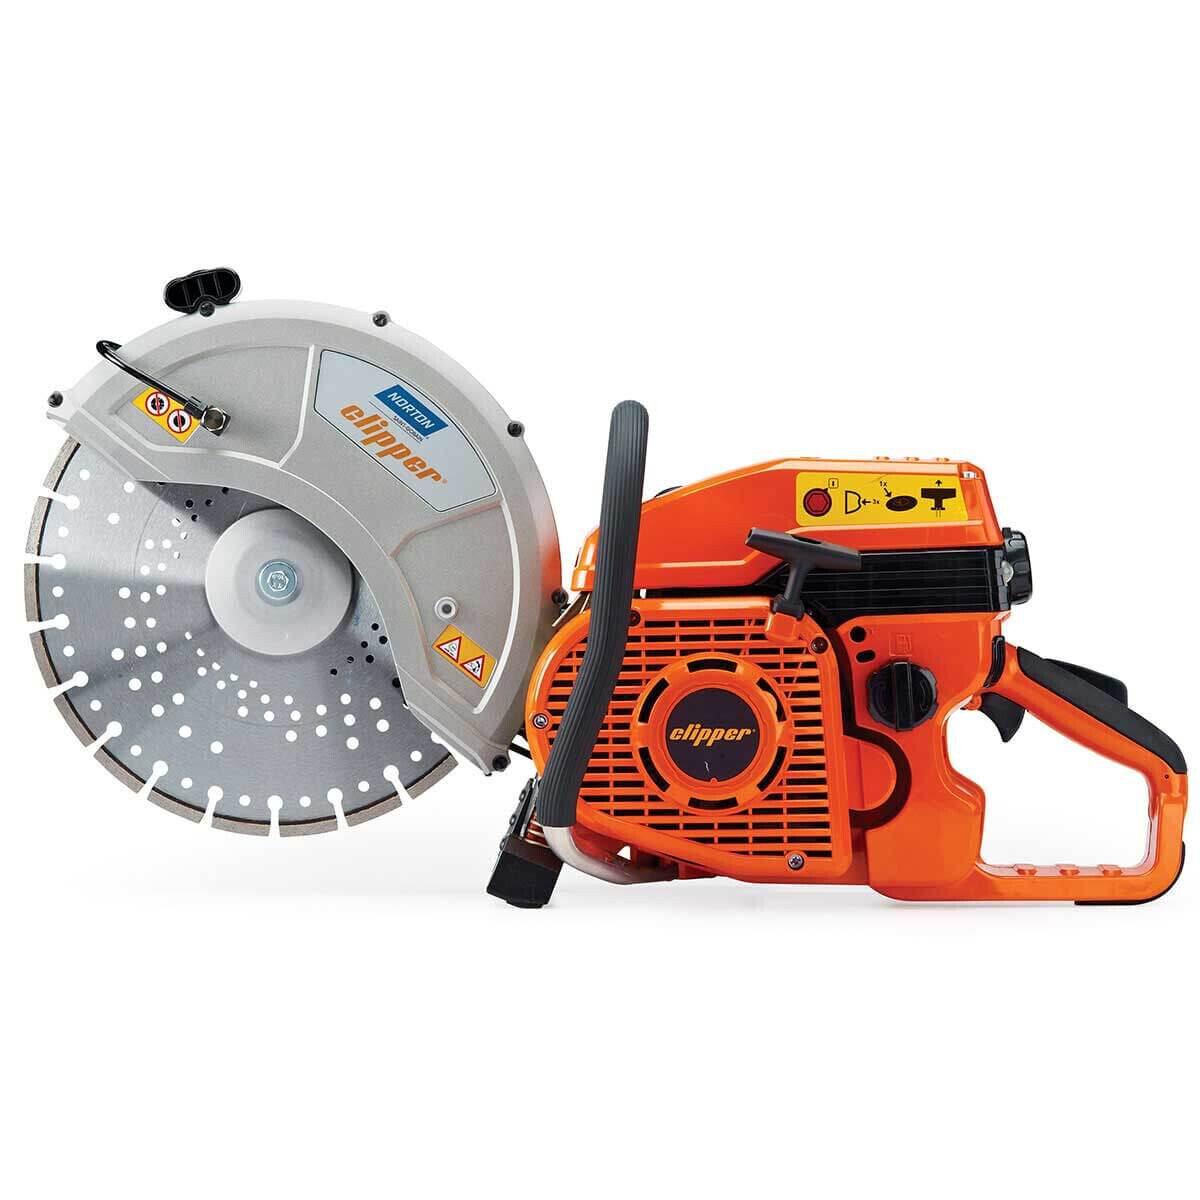 Norton Clipper CP514-350 14 inch Cut Off Saw